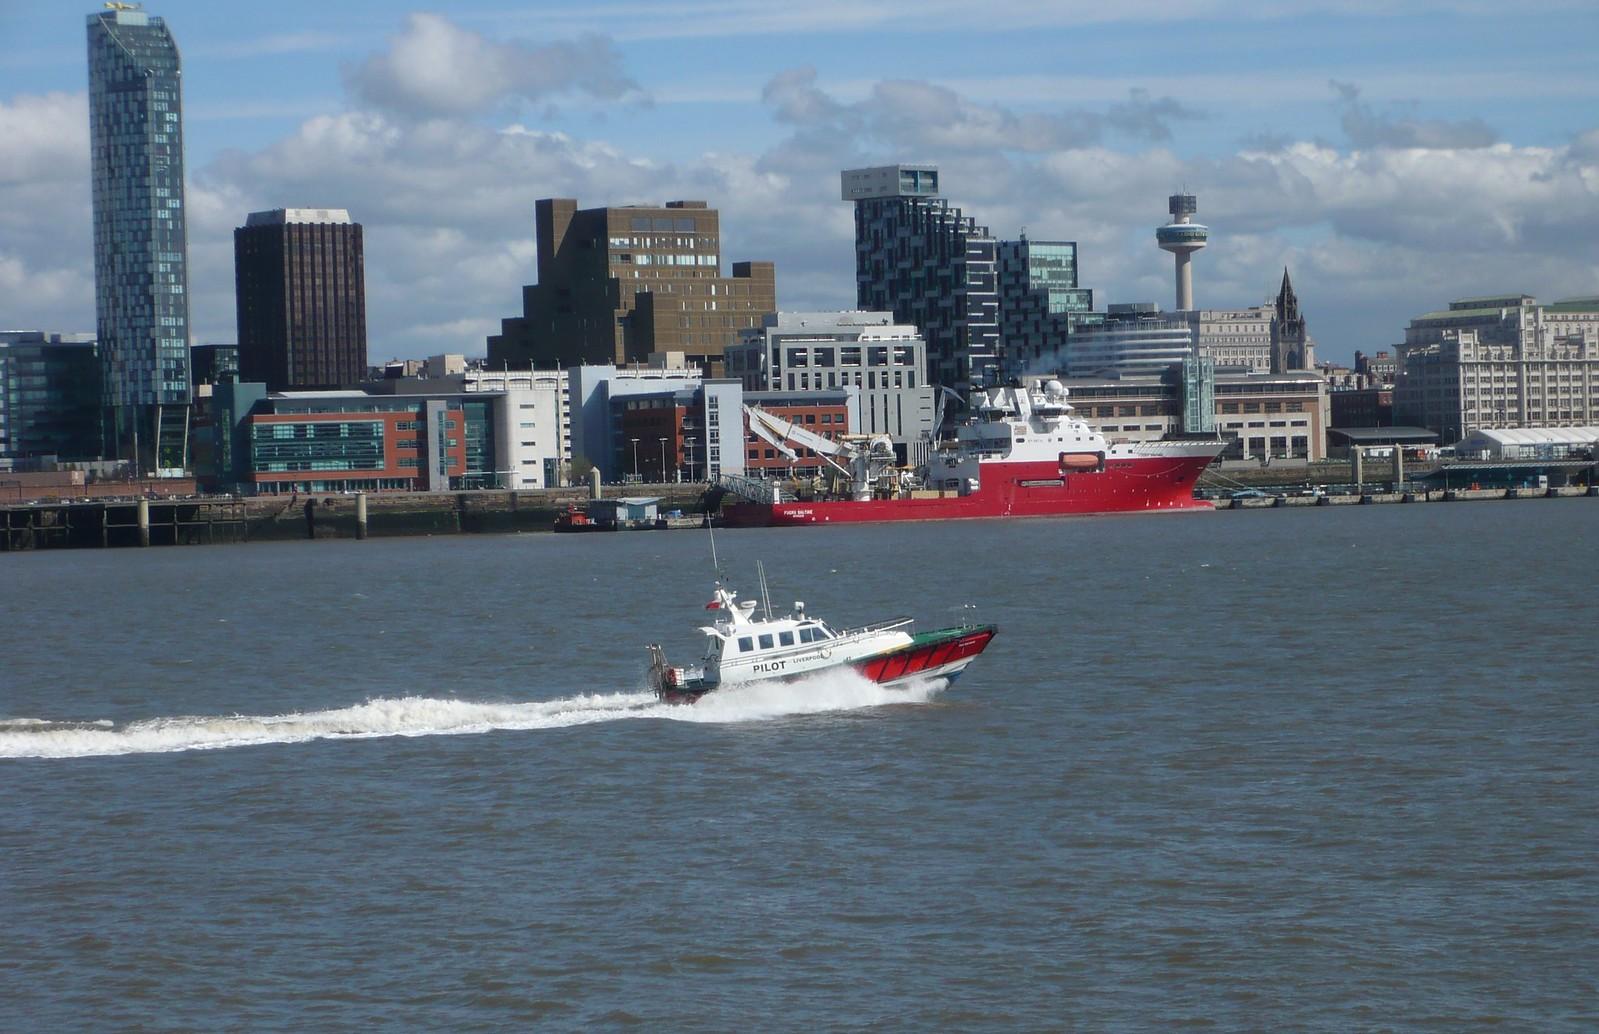 Liverpool Pilot Boat